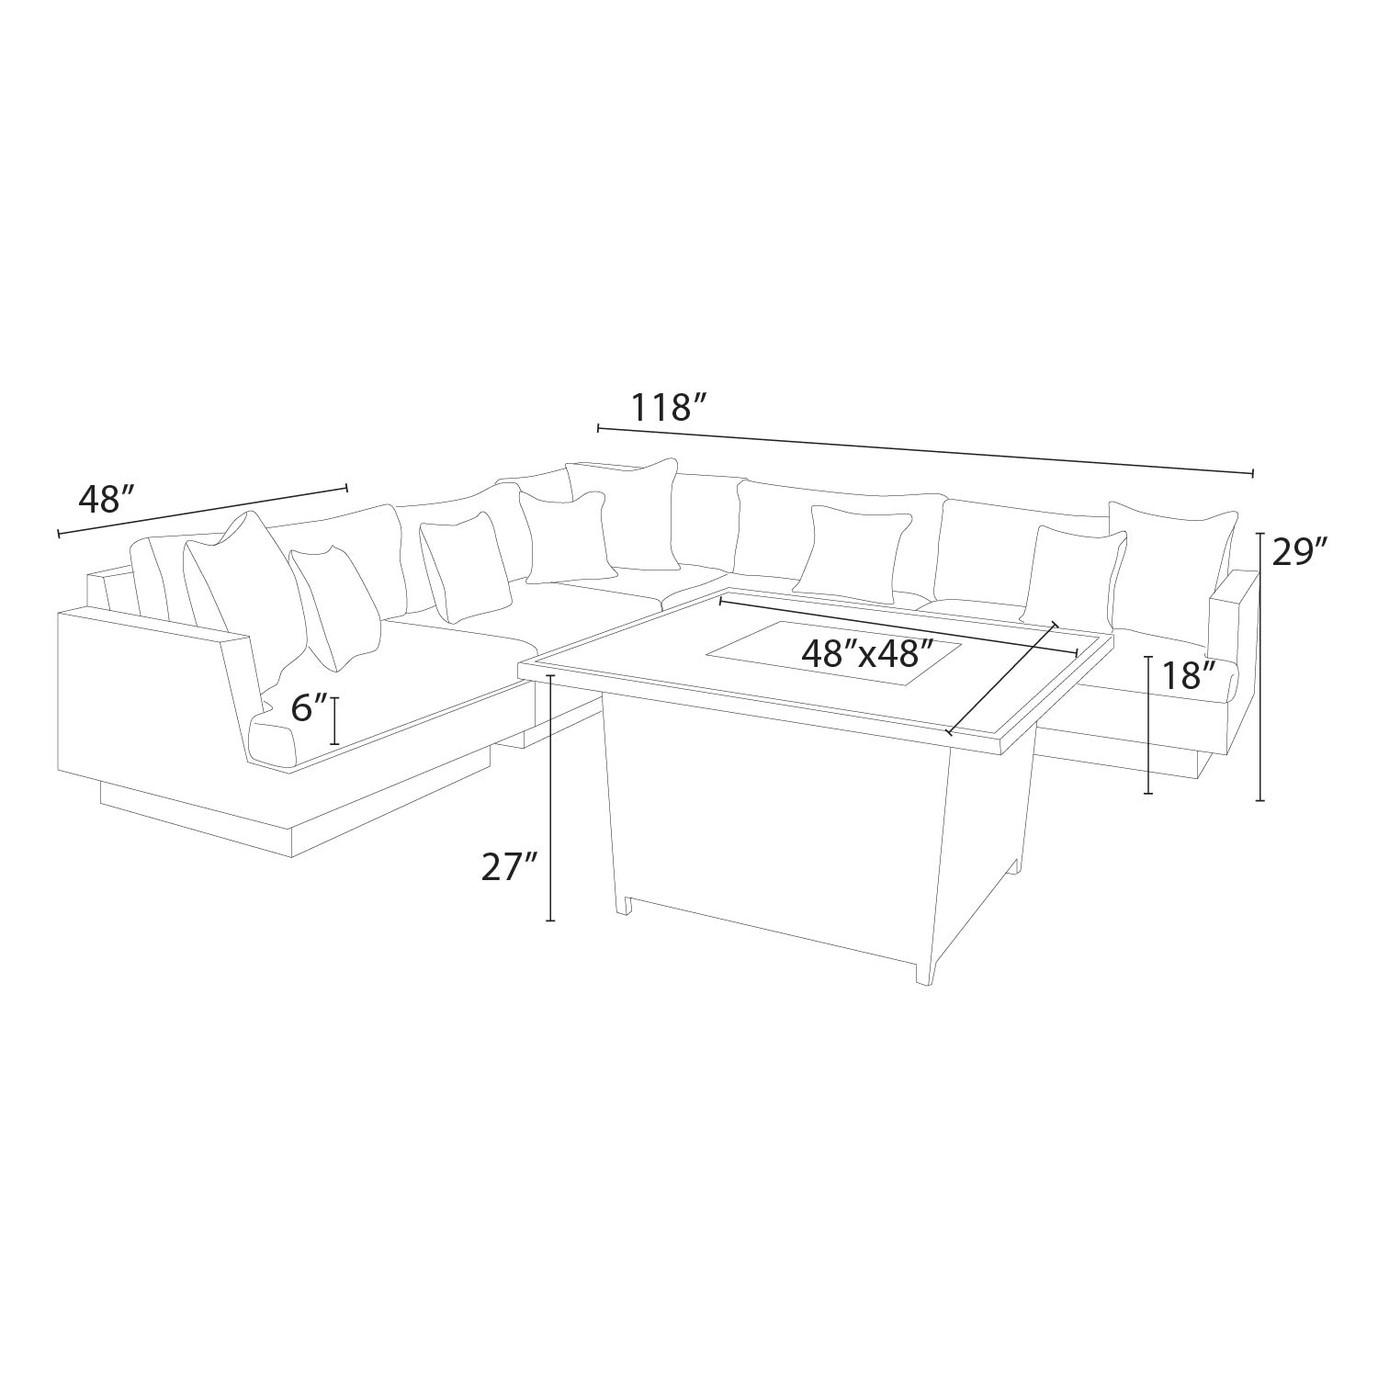 Portofino™ Comfort 6pc Sectional & Fire Table - Laguna Blue